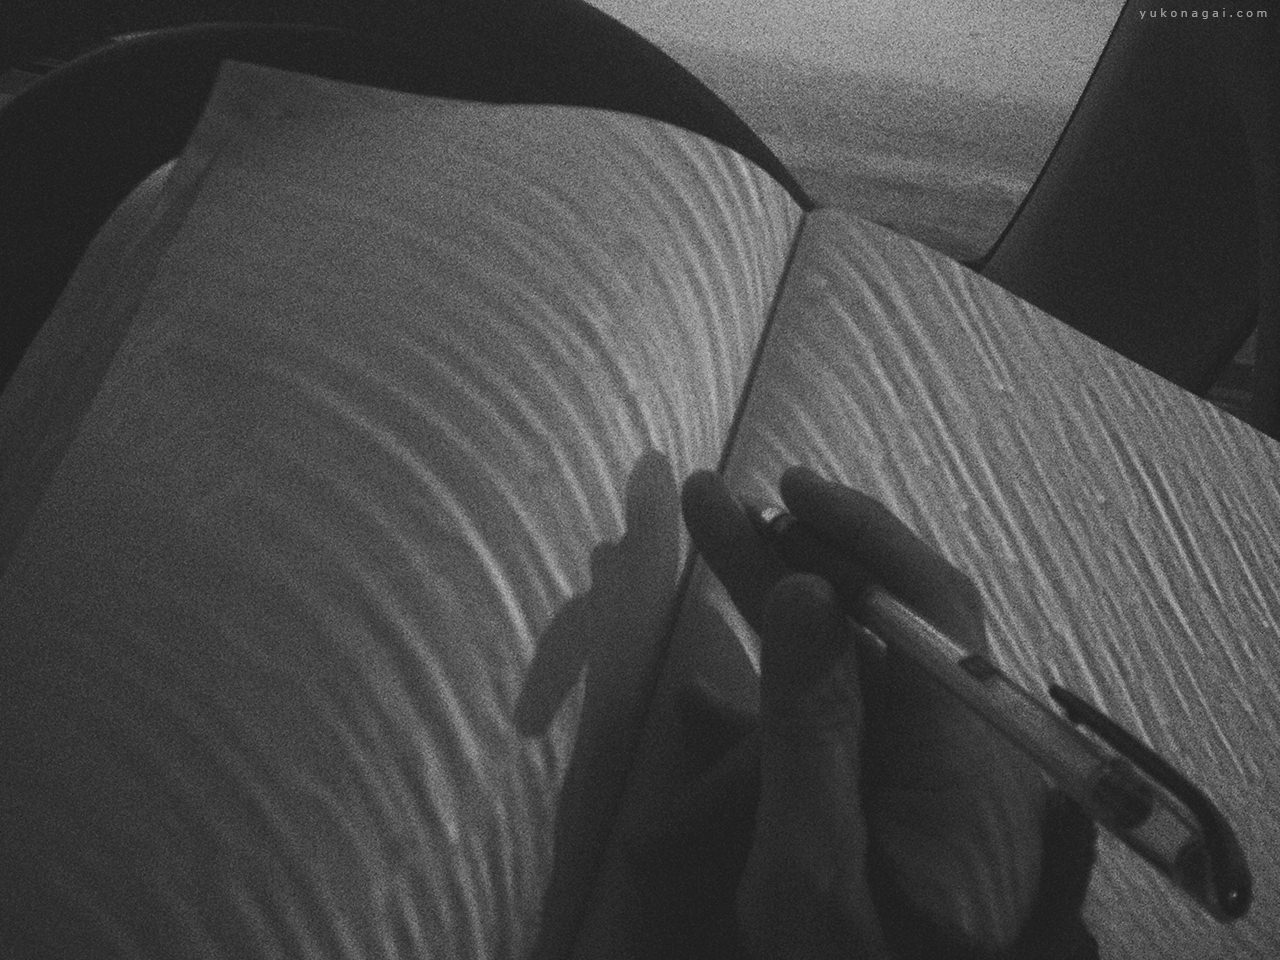 Windshield rain shadows on a journal.